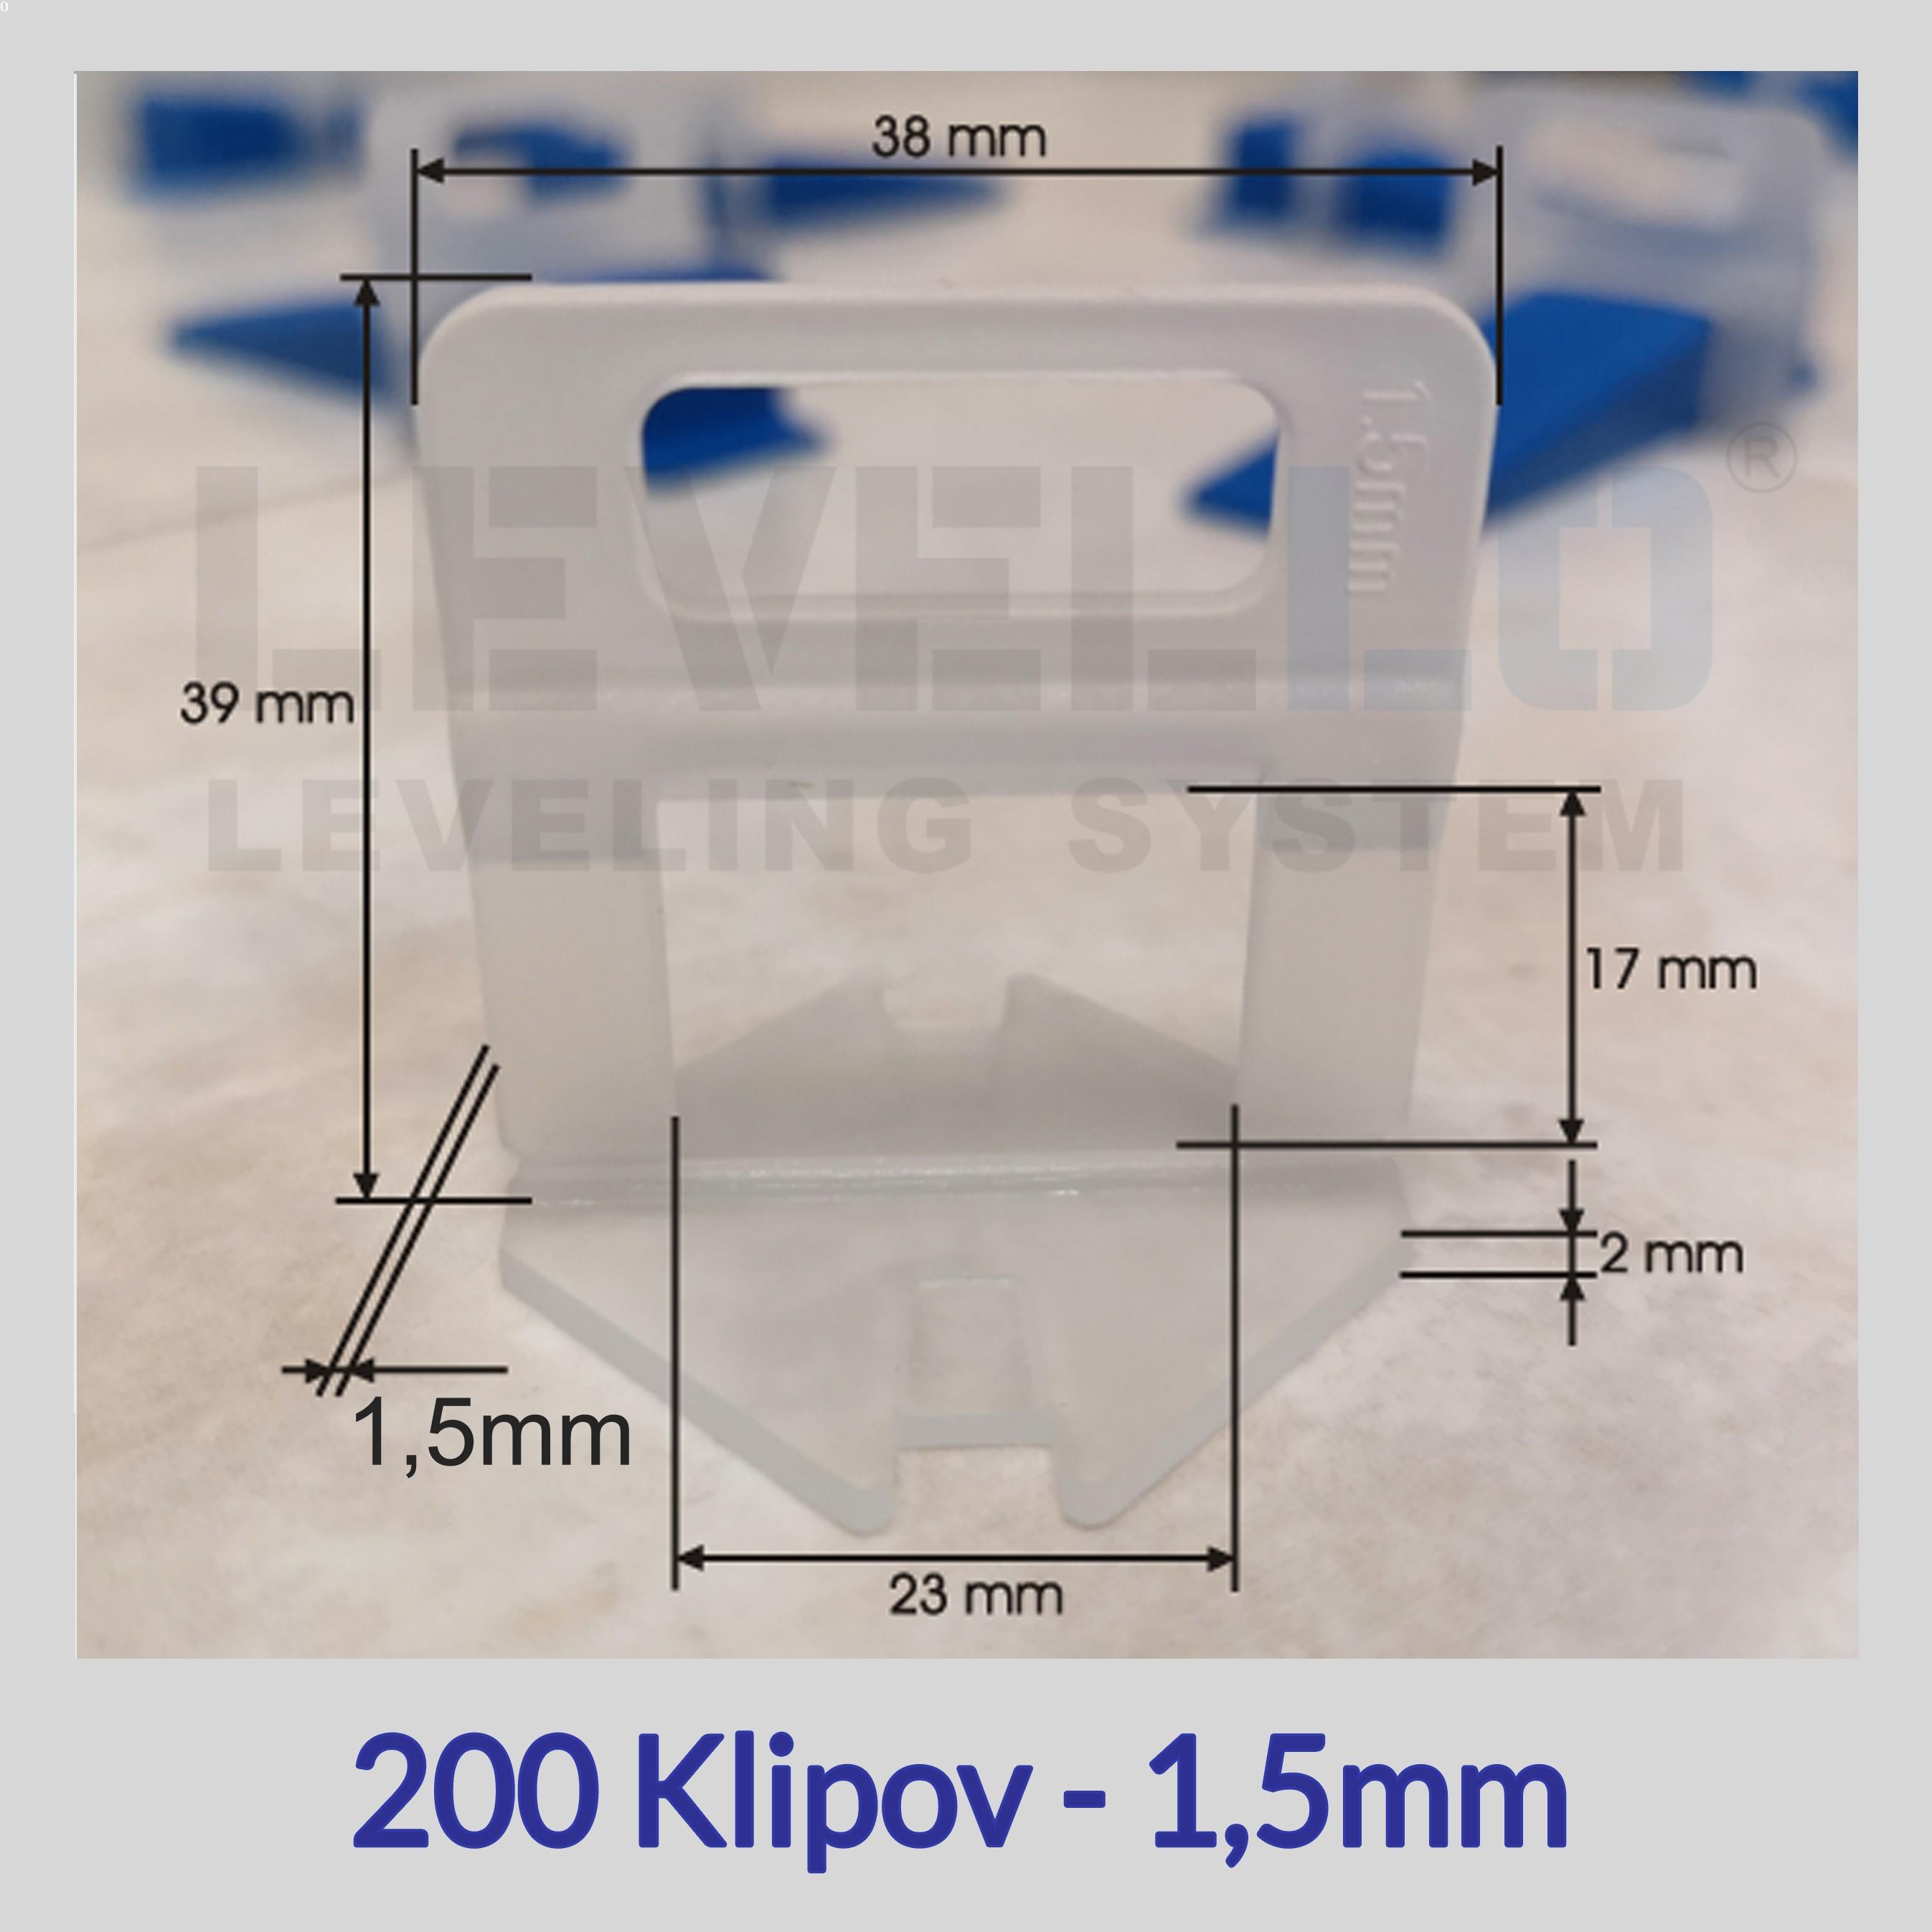 Klipy Eko LEVELLO ® 1,5 mm, 200 kusov